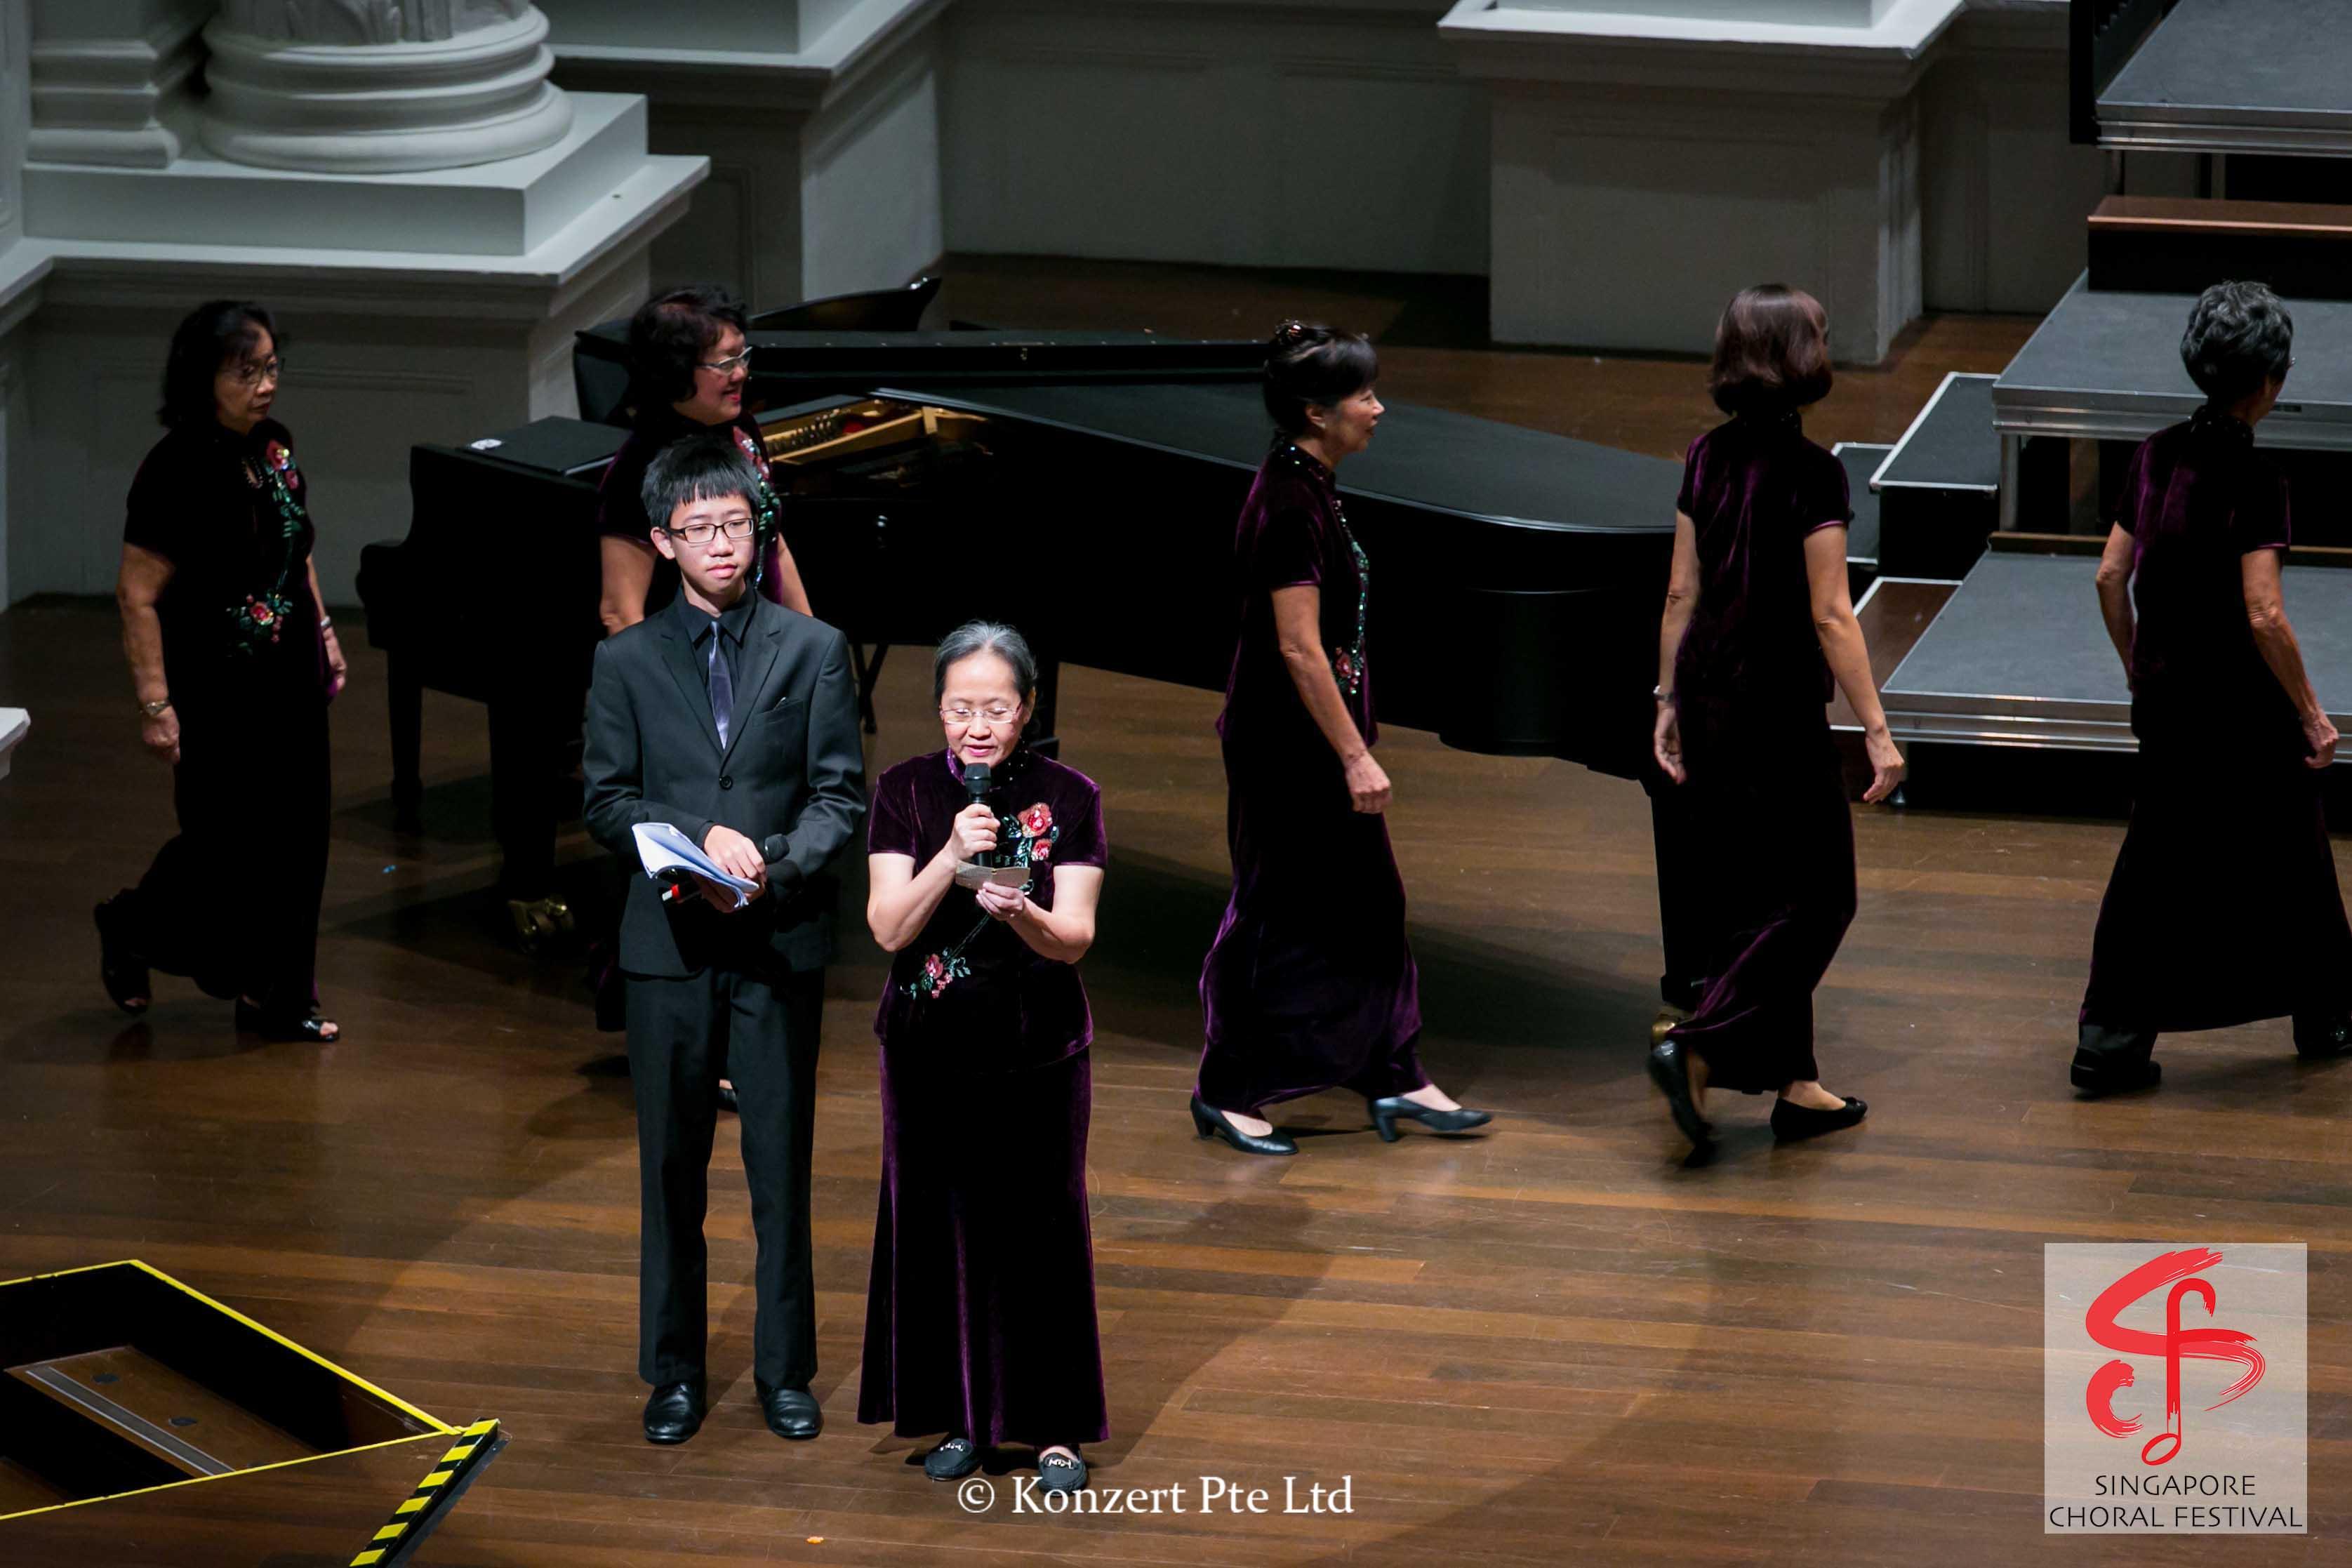 Singapore Choral Festival 8-8-15 (192).jpg